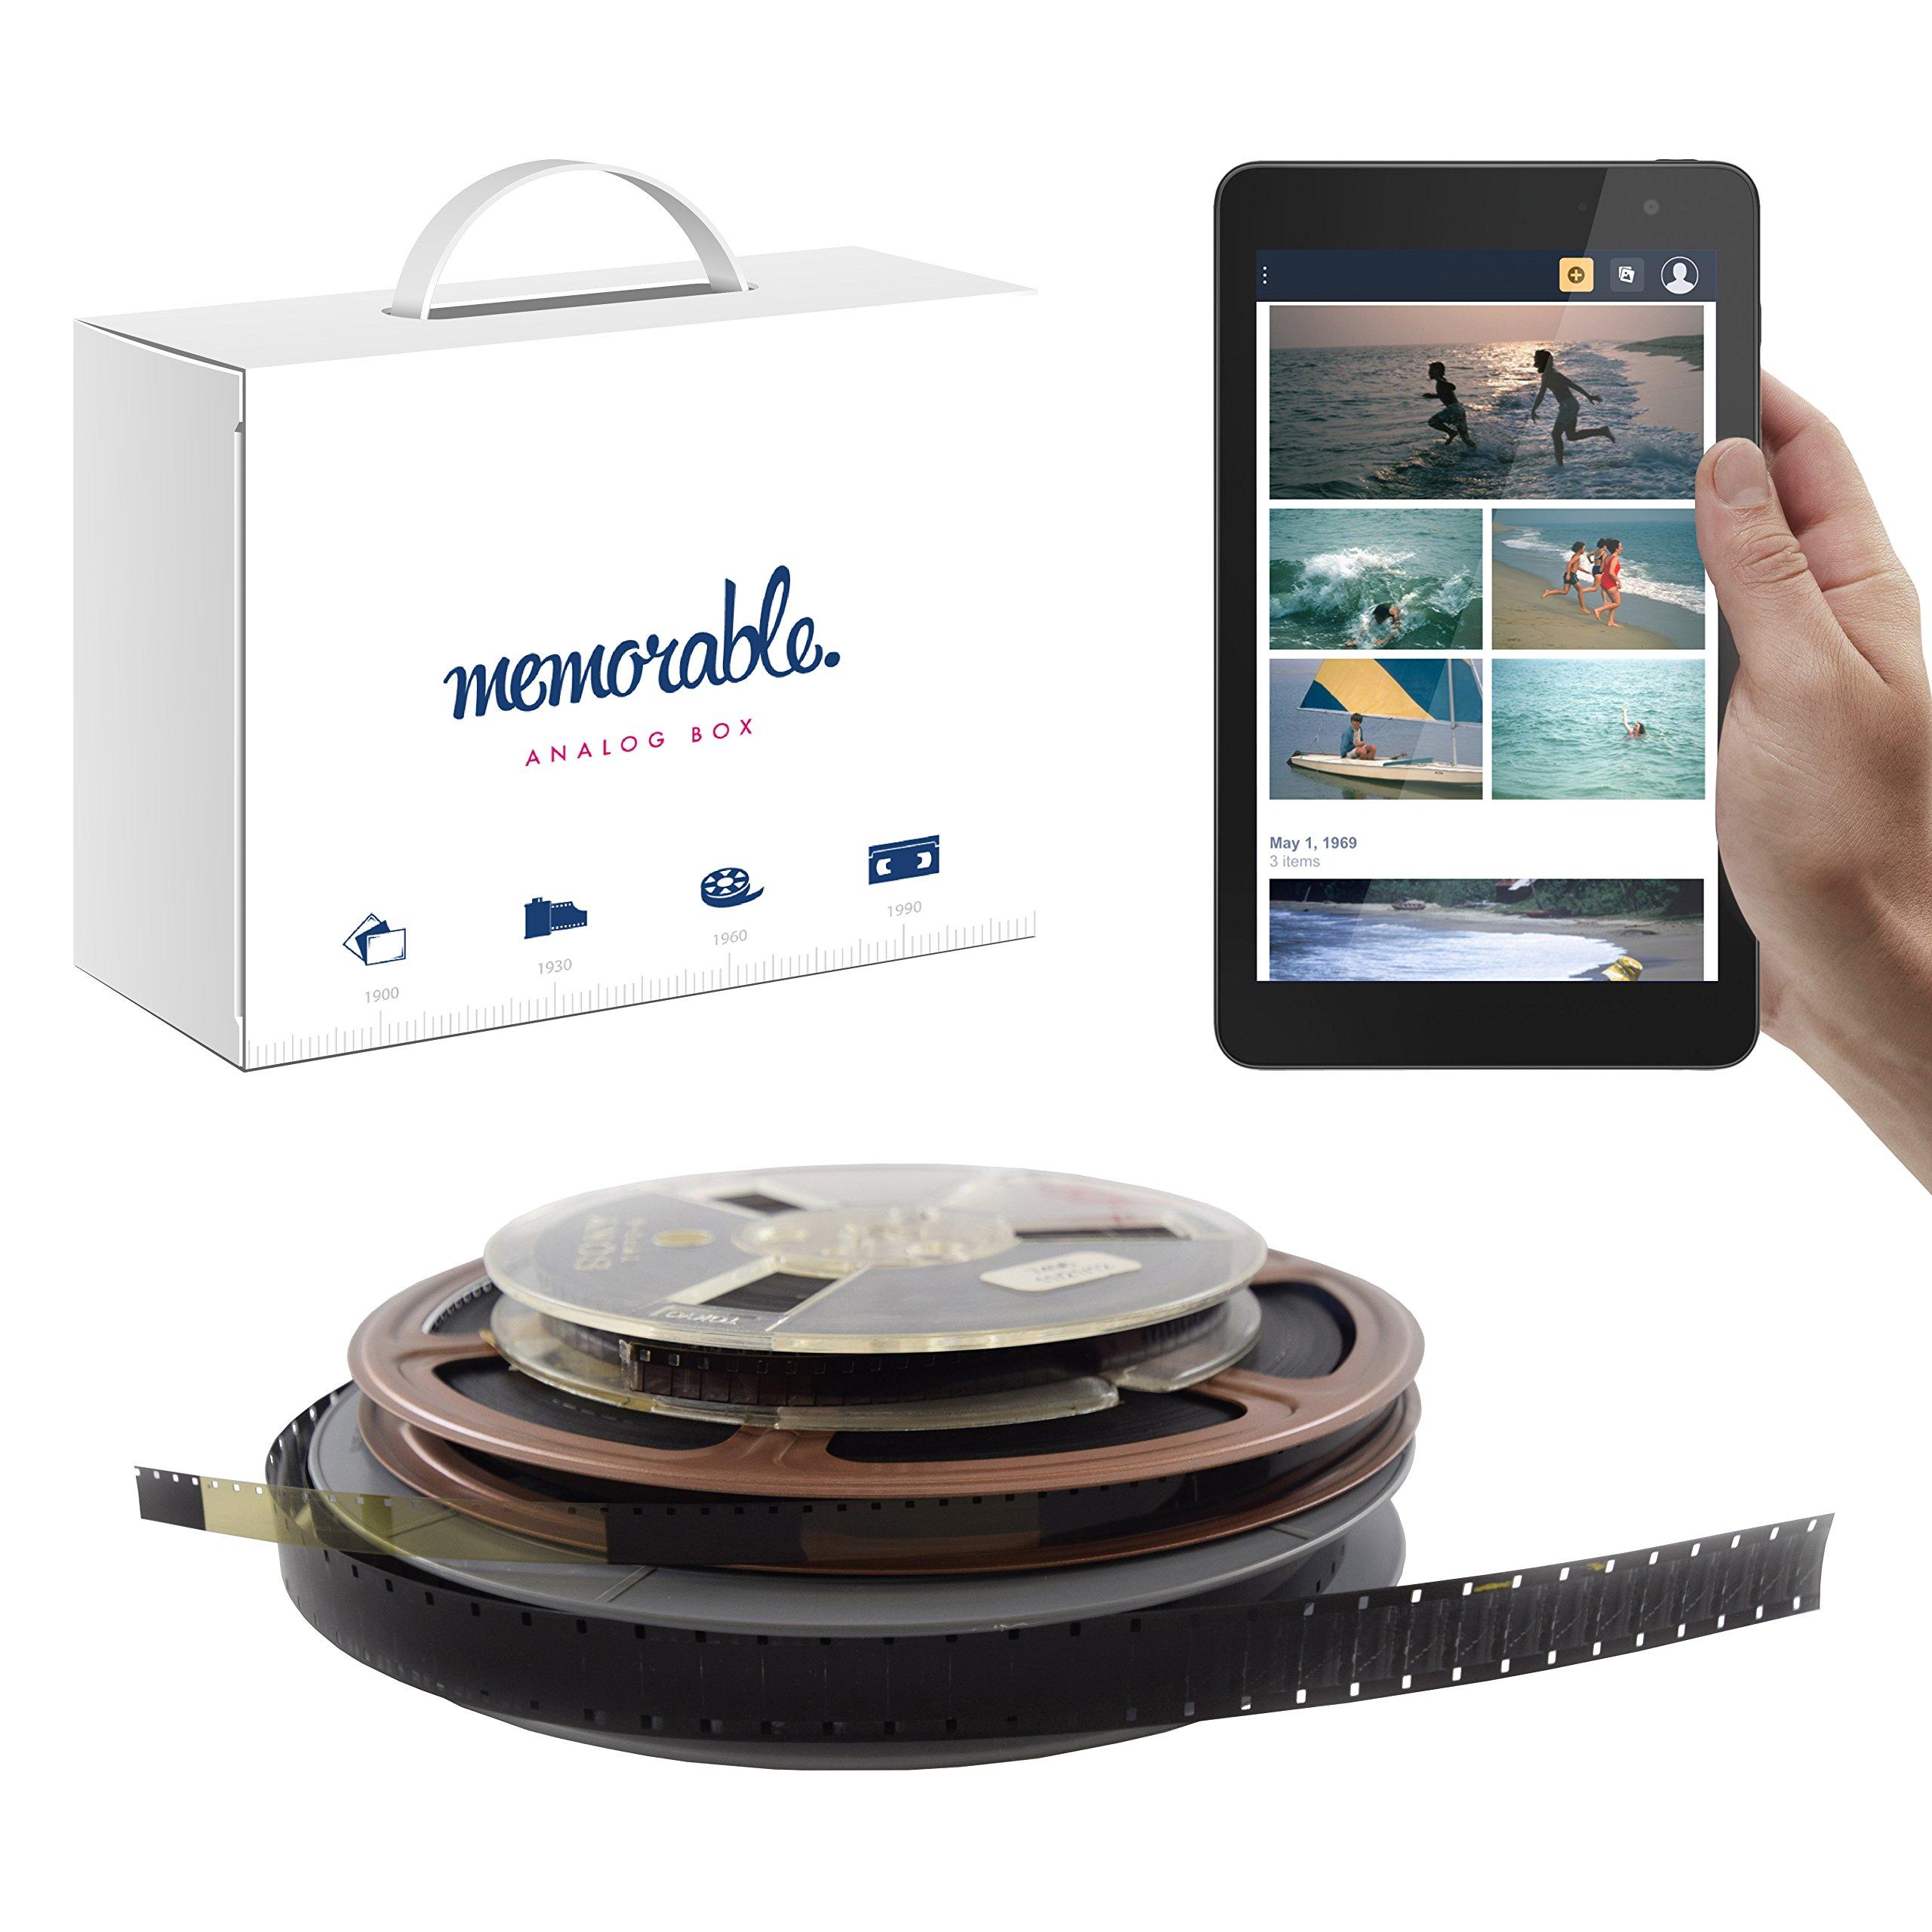 Memorable Film Transfer Service (8mm, Super 8, 16mm) to Prime Photos - 4 Reels